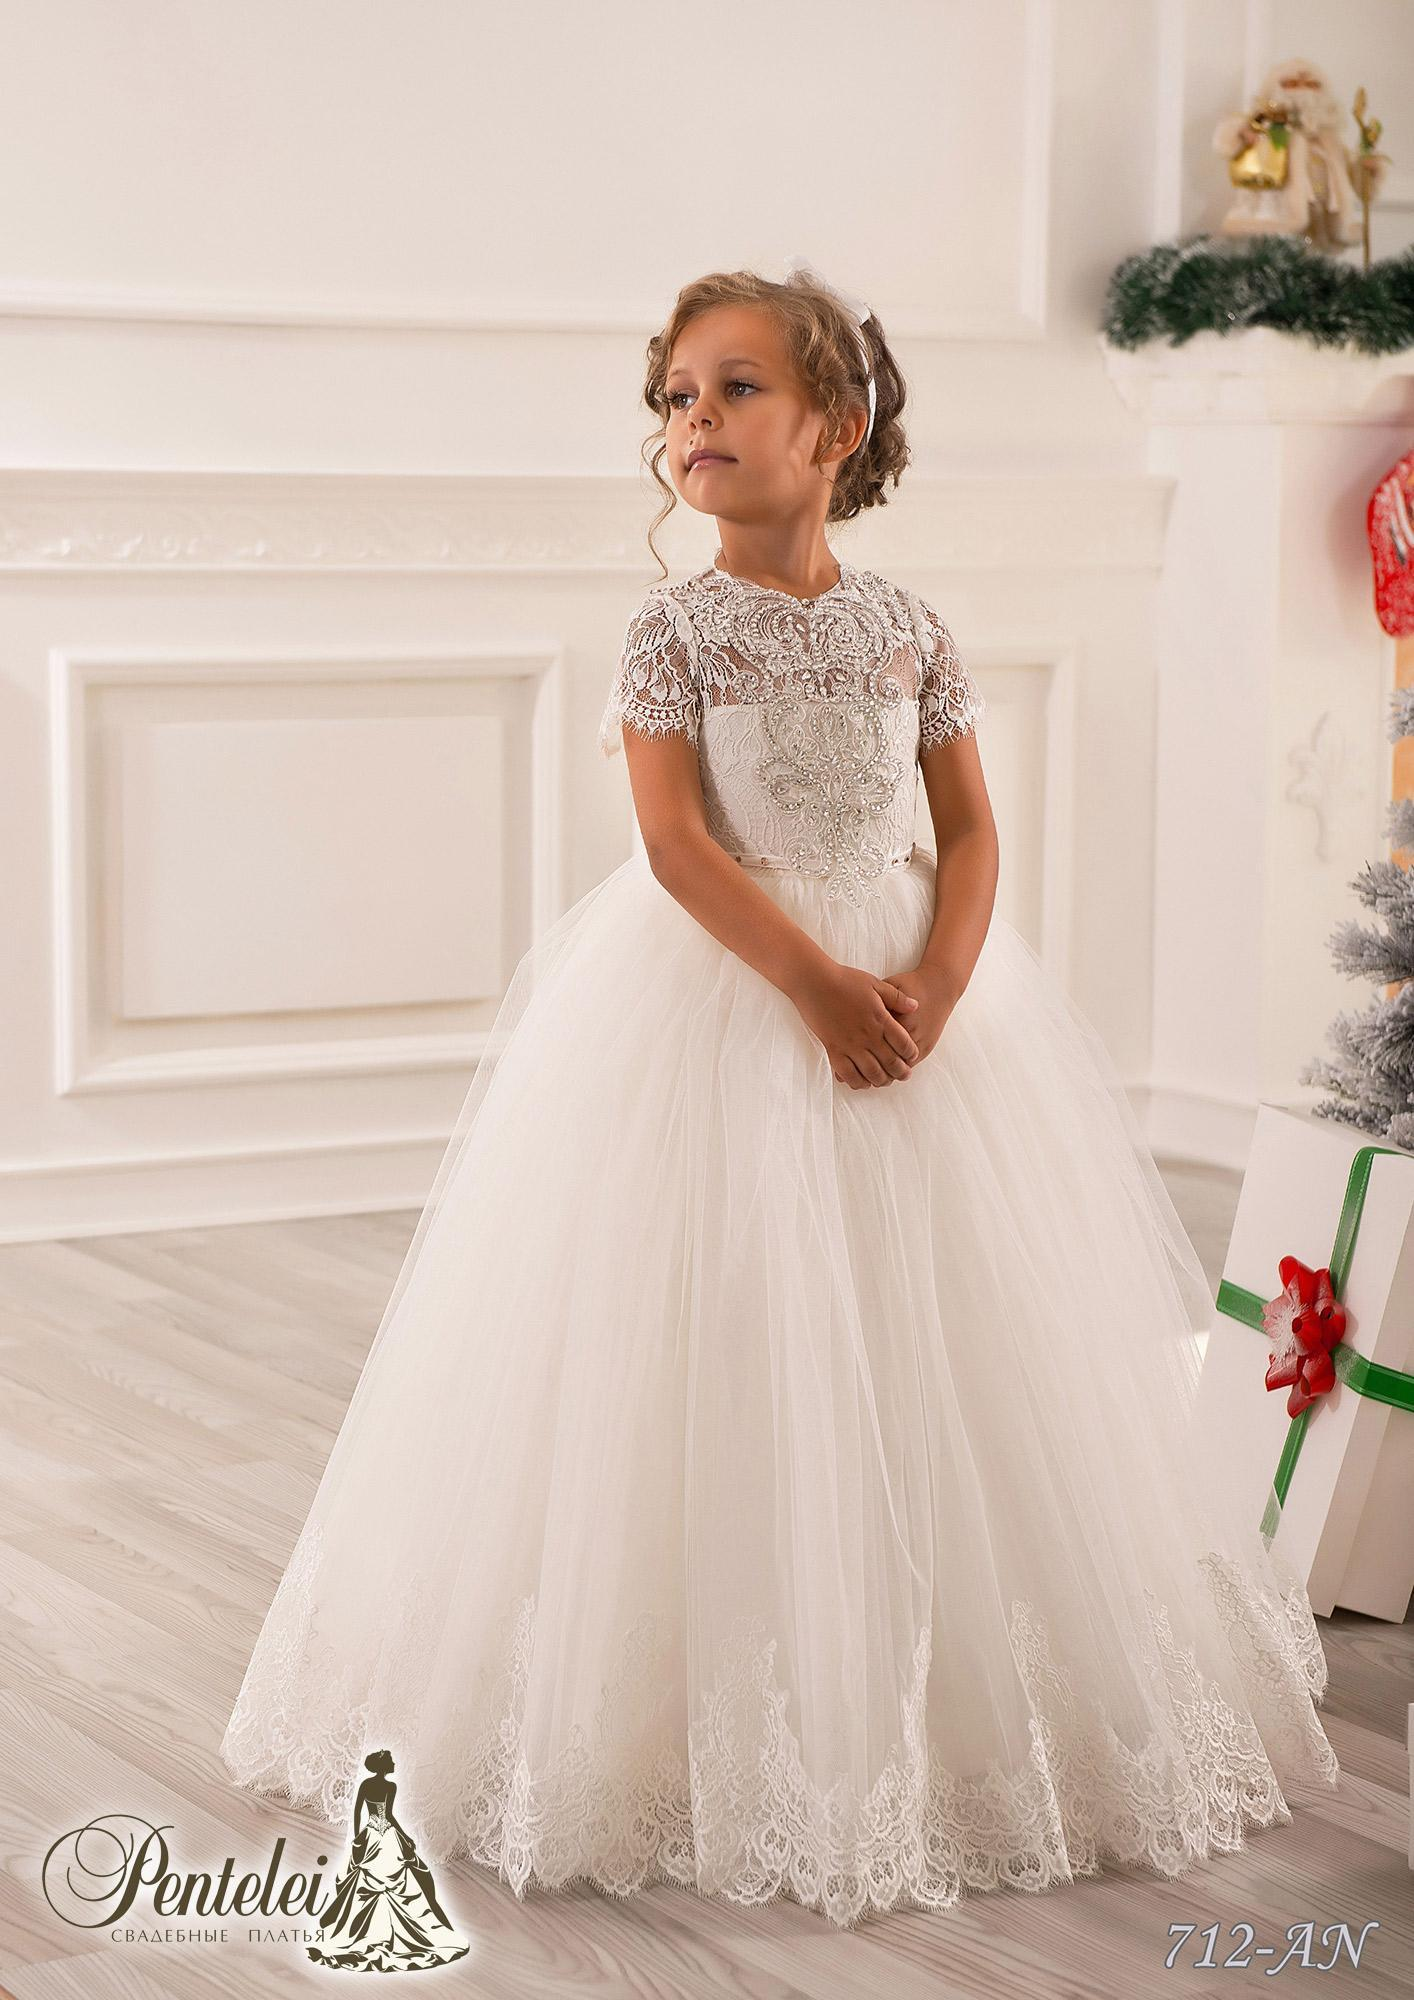 87d8b48f71829 Elegant Flower Girls' Dress Short Sleeves Toddler Crystals Cupcake Princess  Miniature Girls Wedding Dresses Flowers Girls Dresses Flowers Girls ...